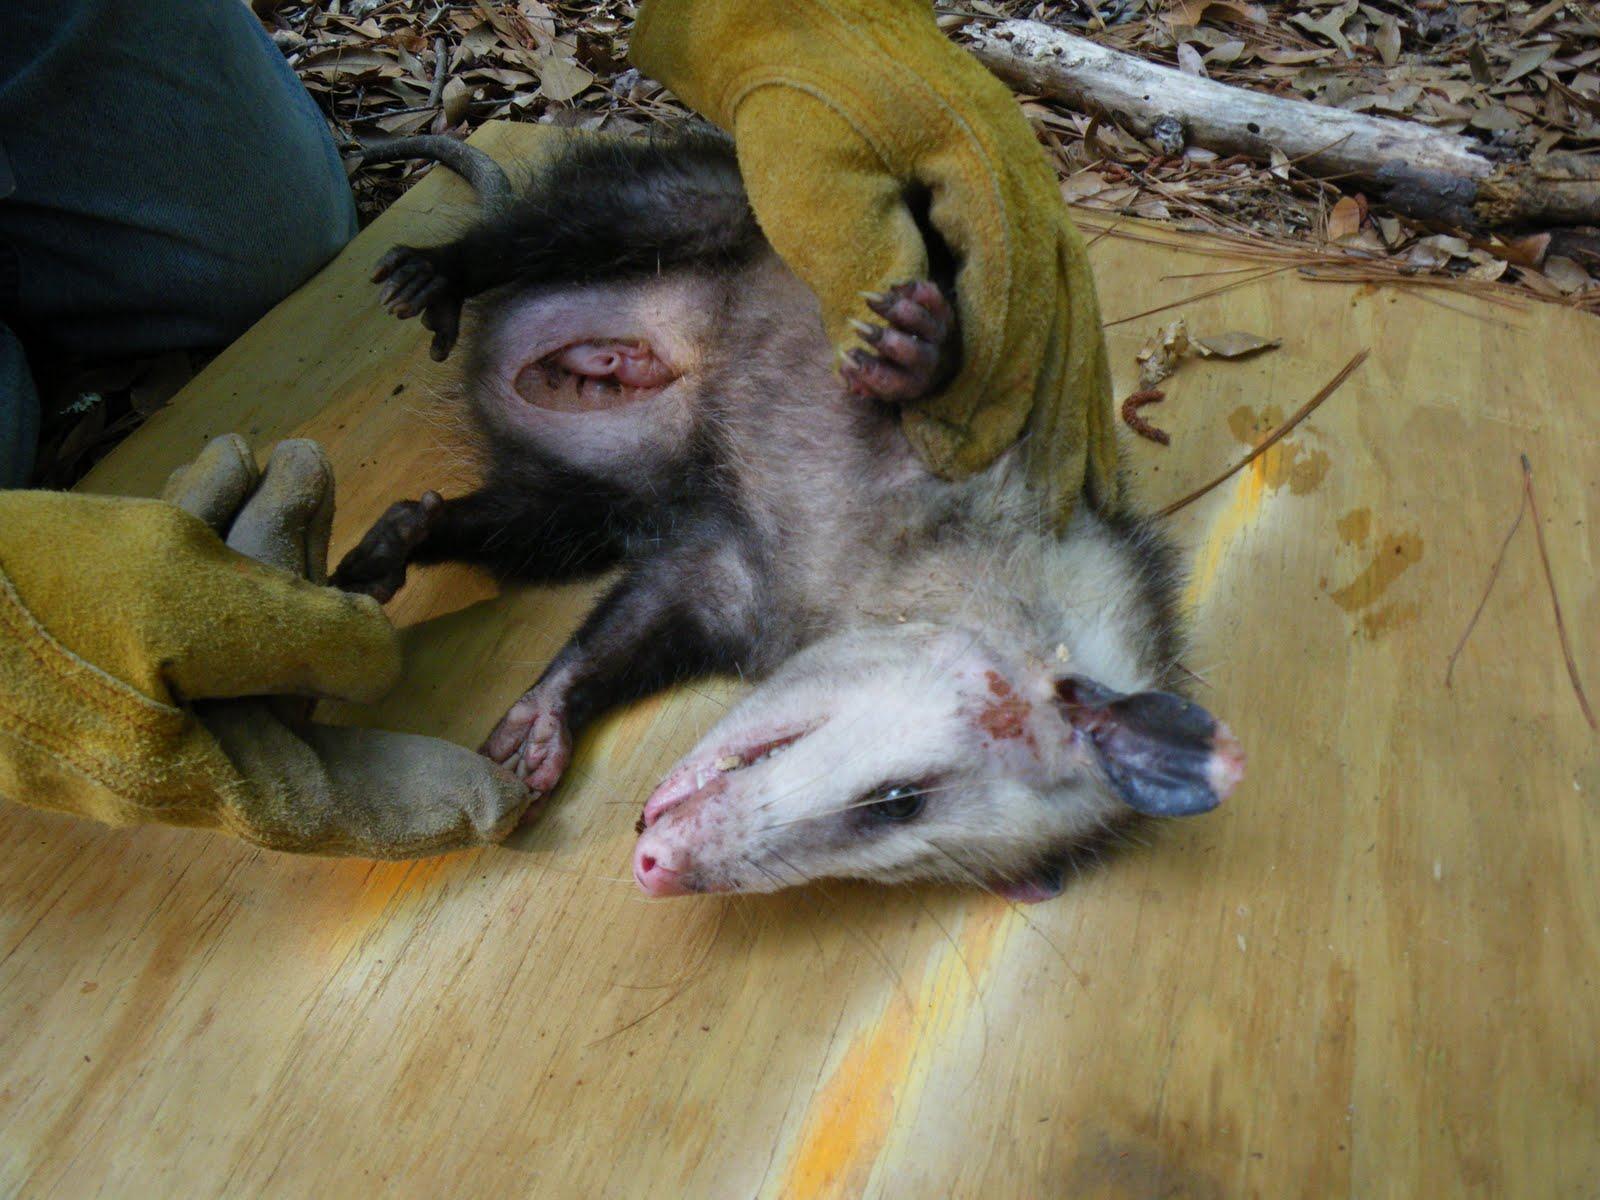 Dear Mama Opossum